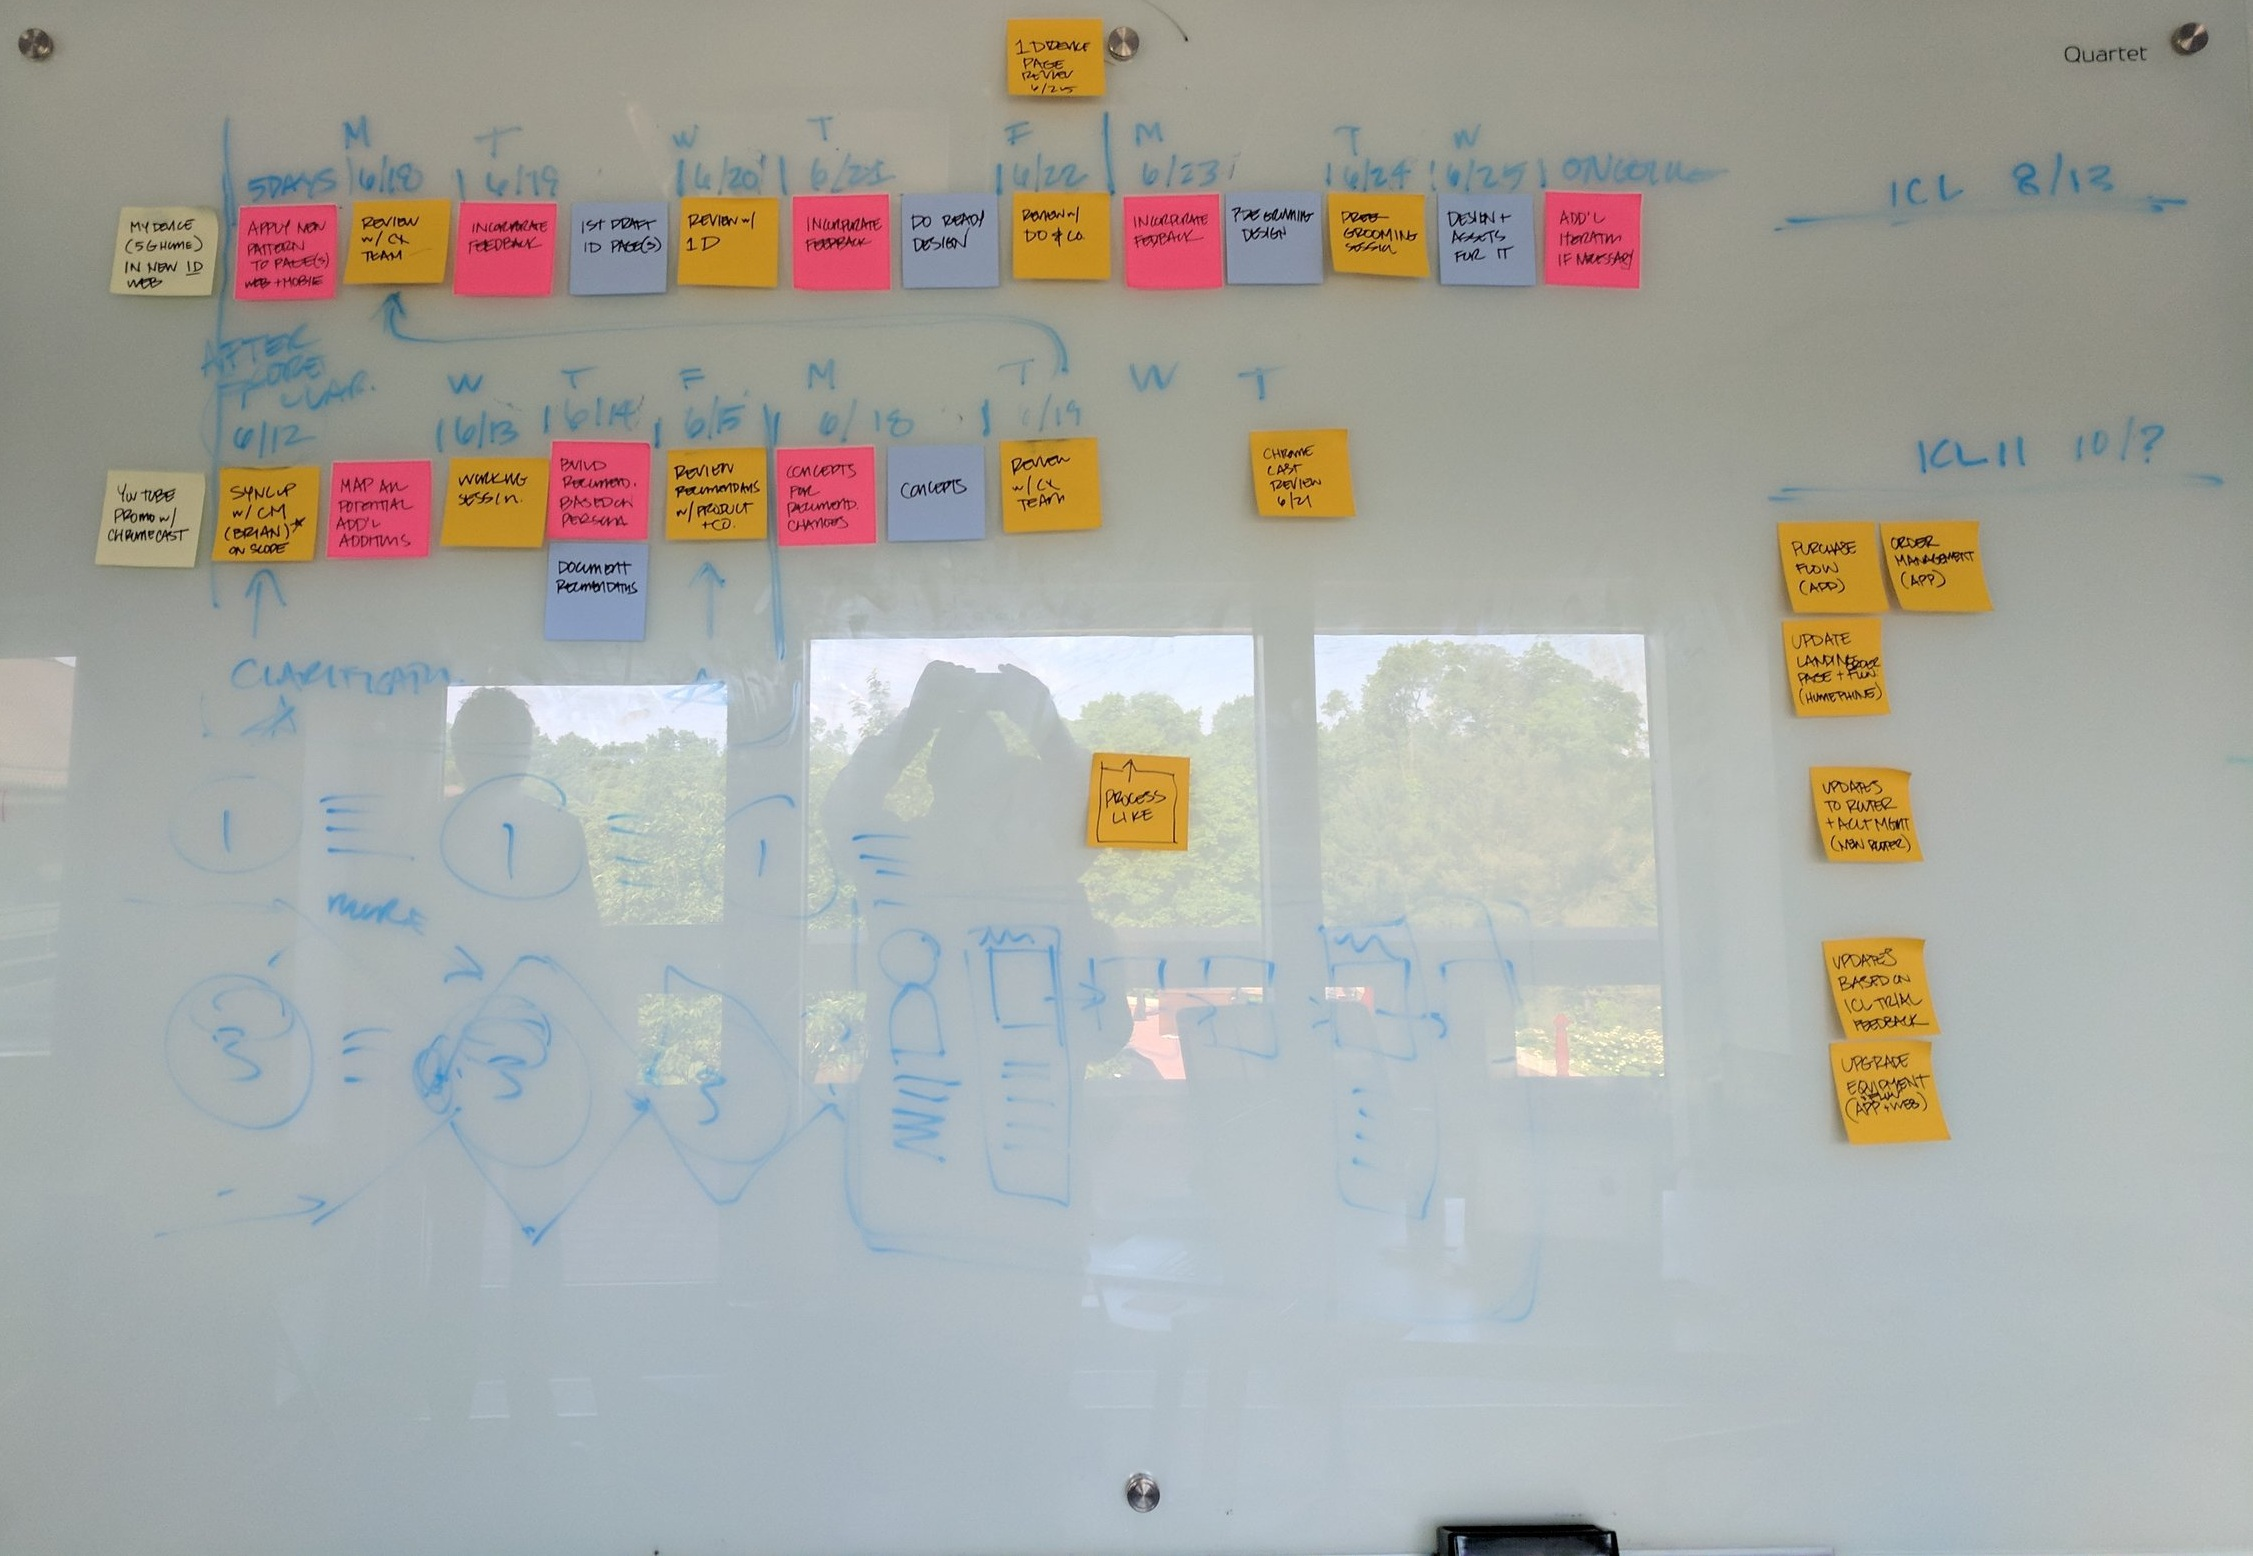 Design roadmap image